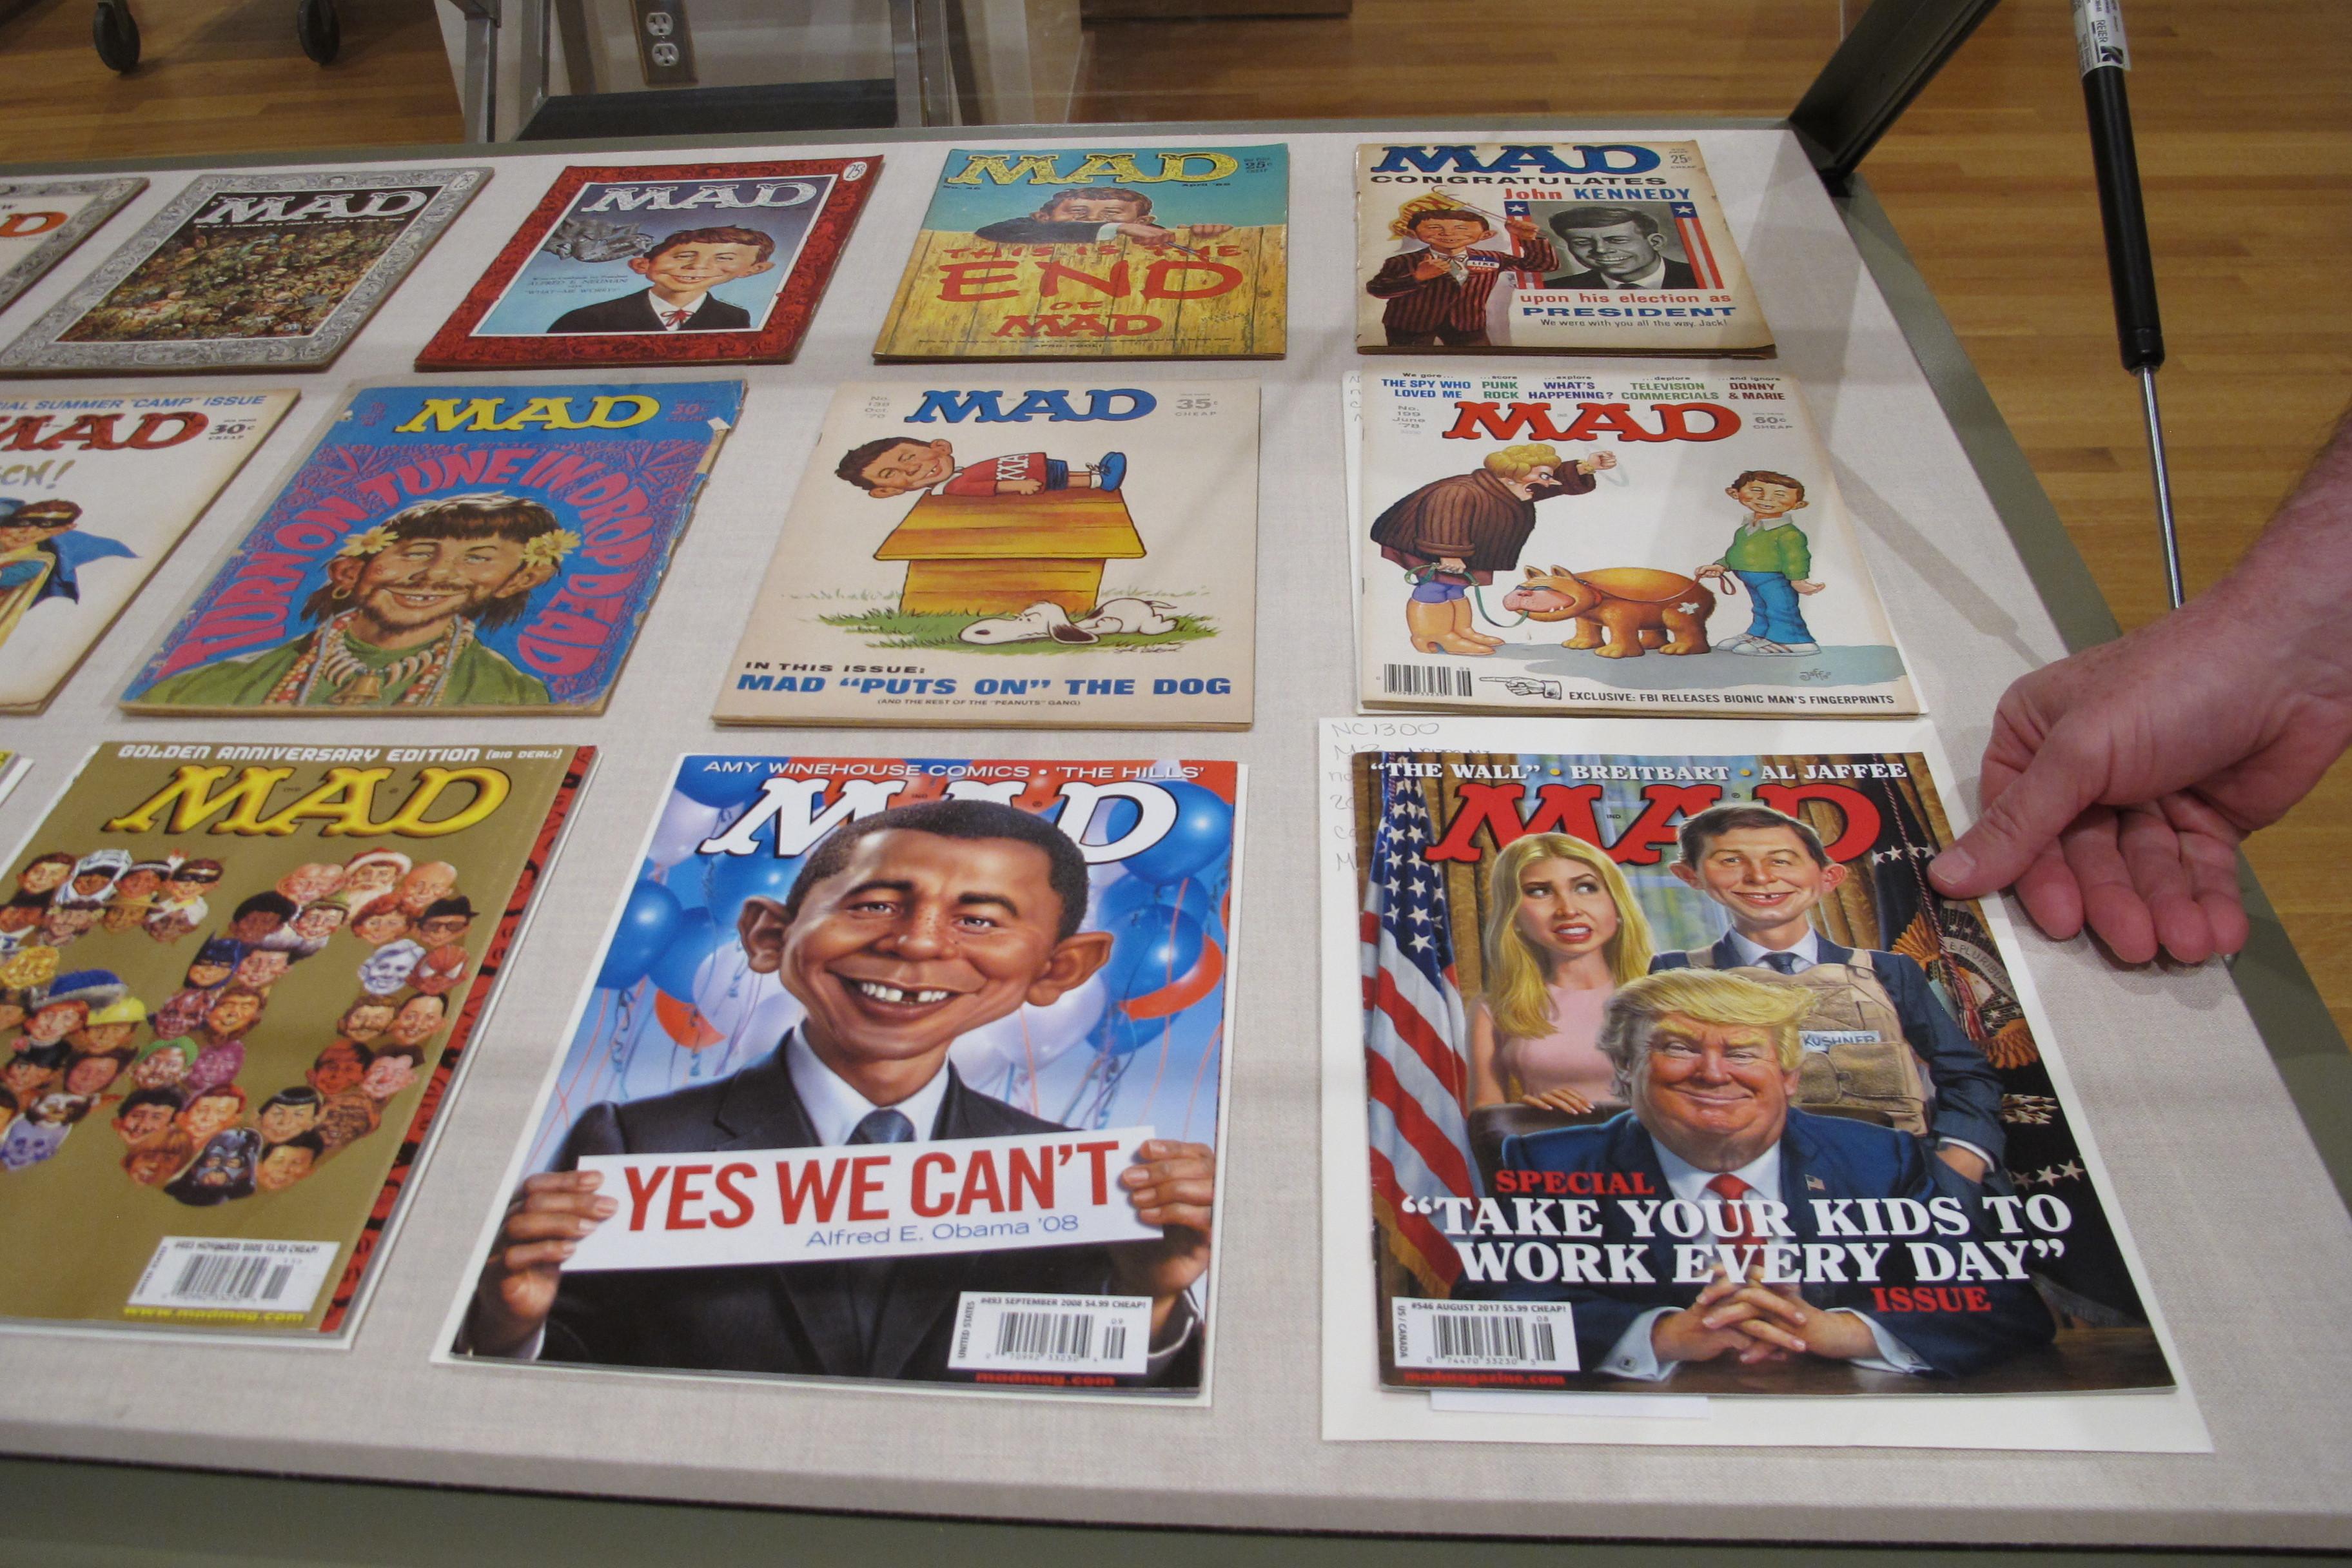 MAD Magazine shutting down: Reports - Washington Times